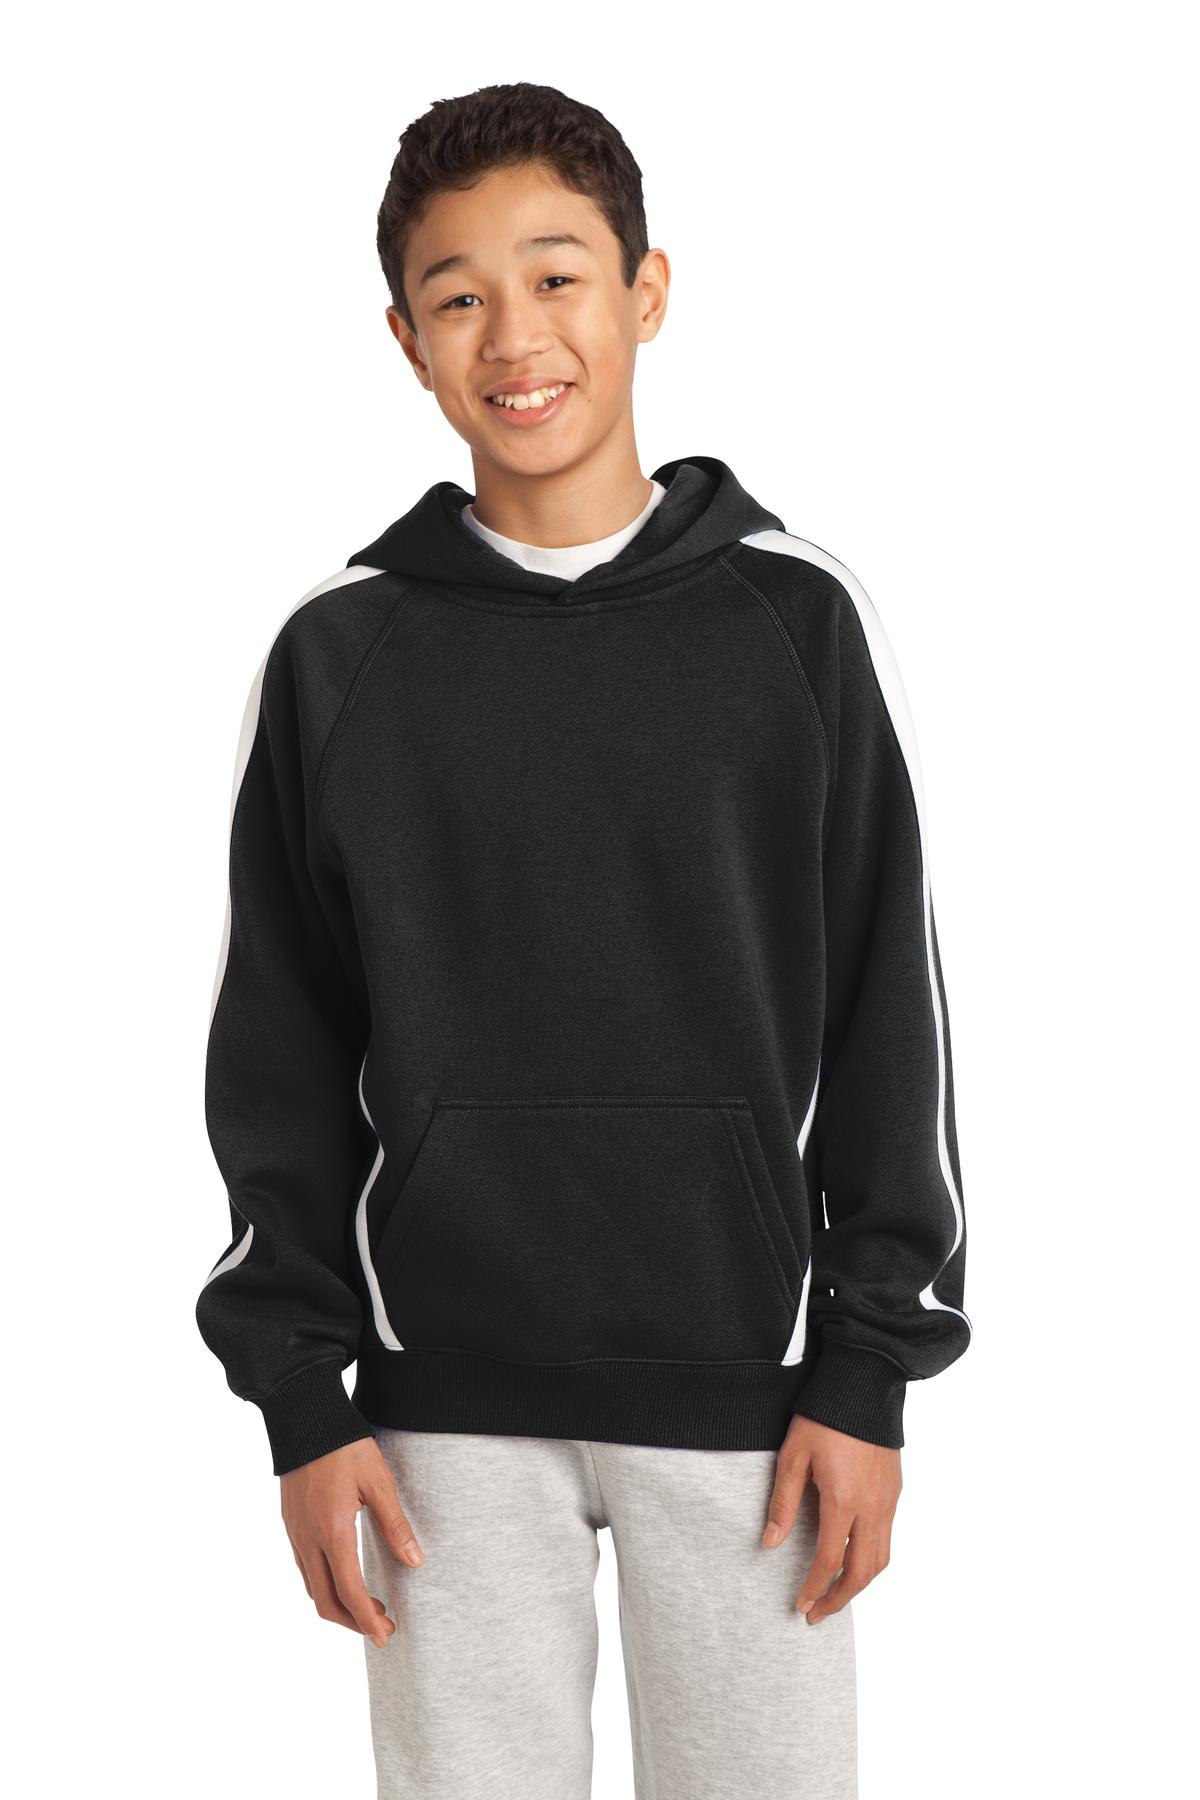 Sleeve Stripe Pullover Hooded Sweatshirt